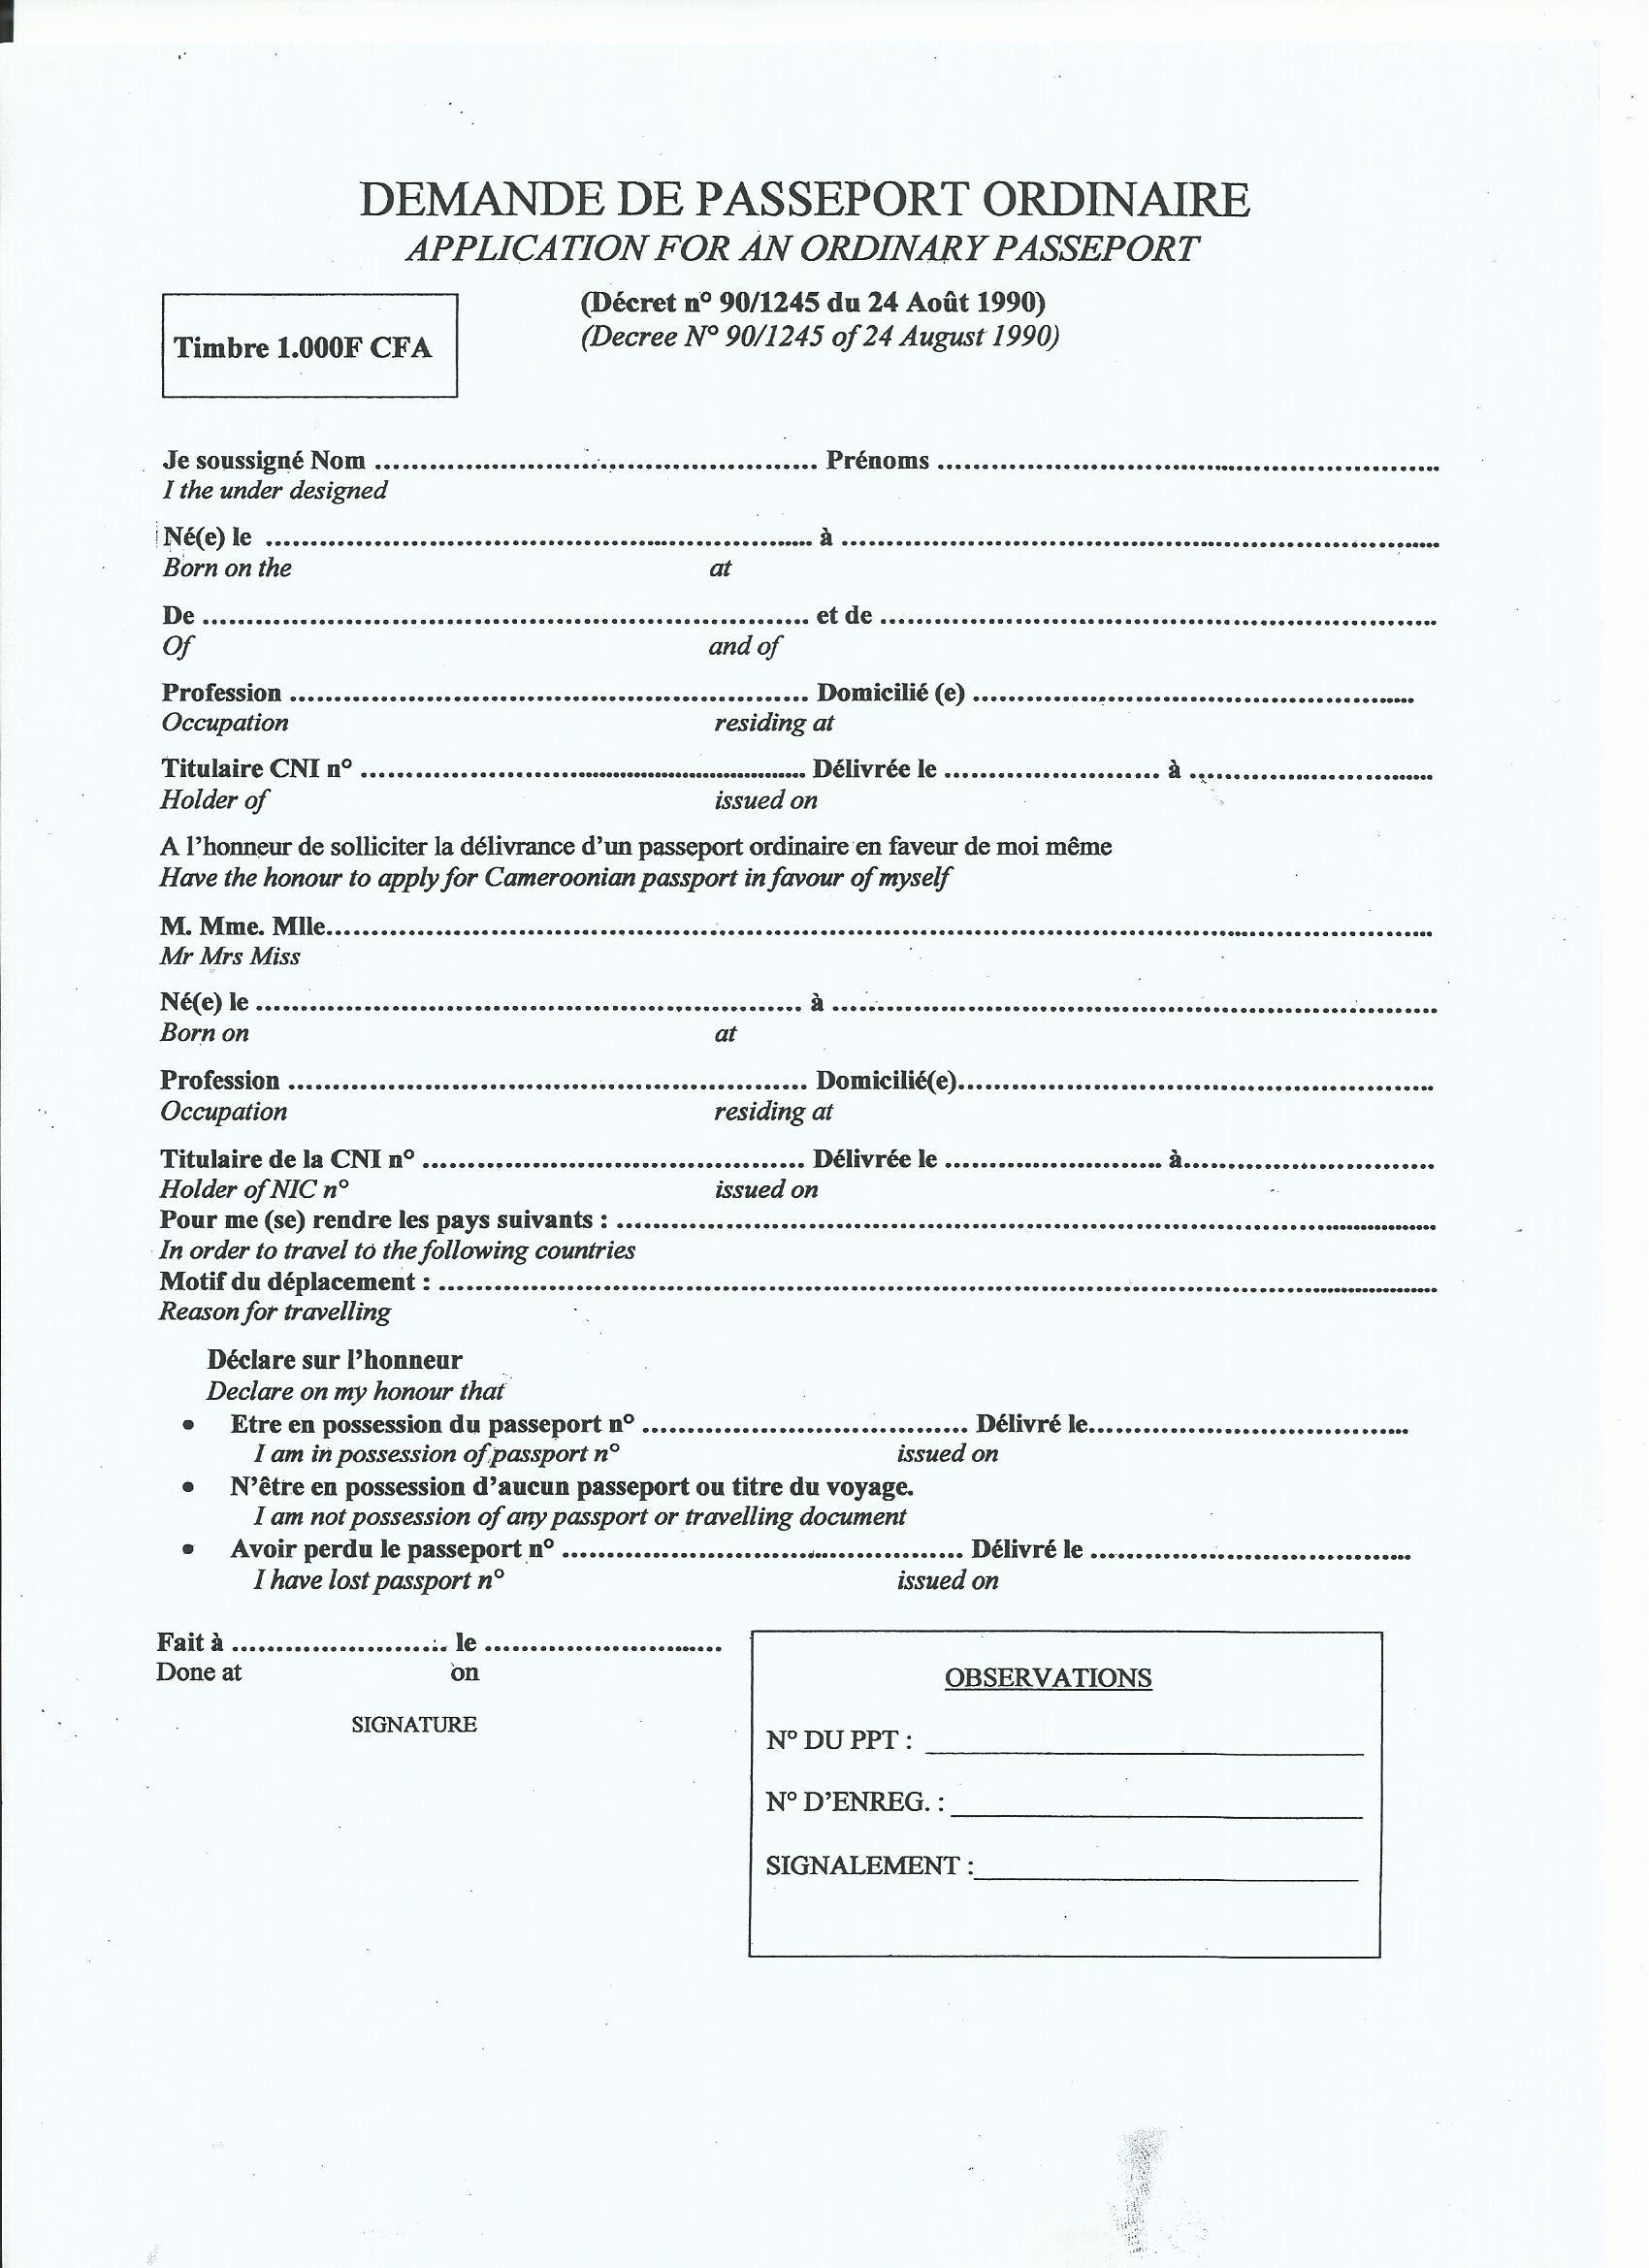 Form: NEW FORM NUMBER FOR PPORT RENEWAL on